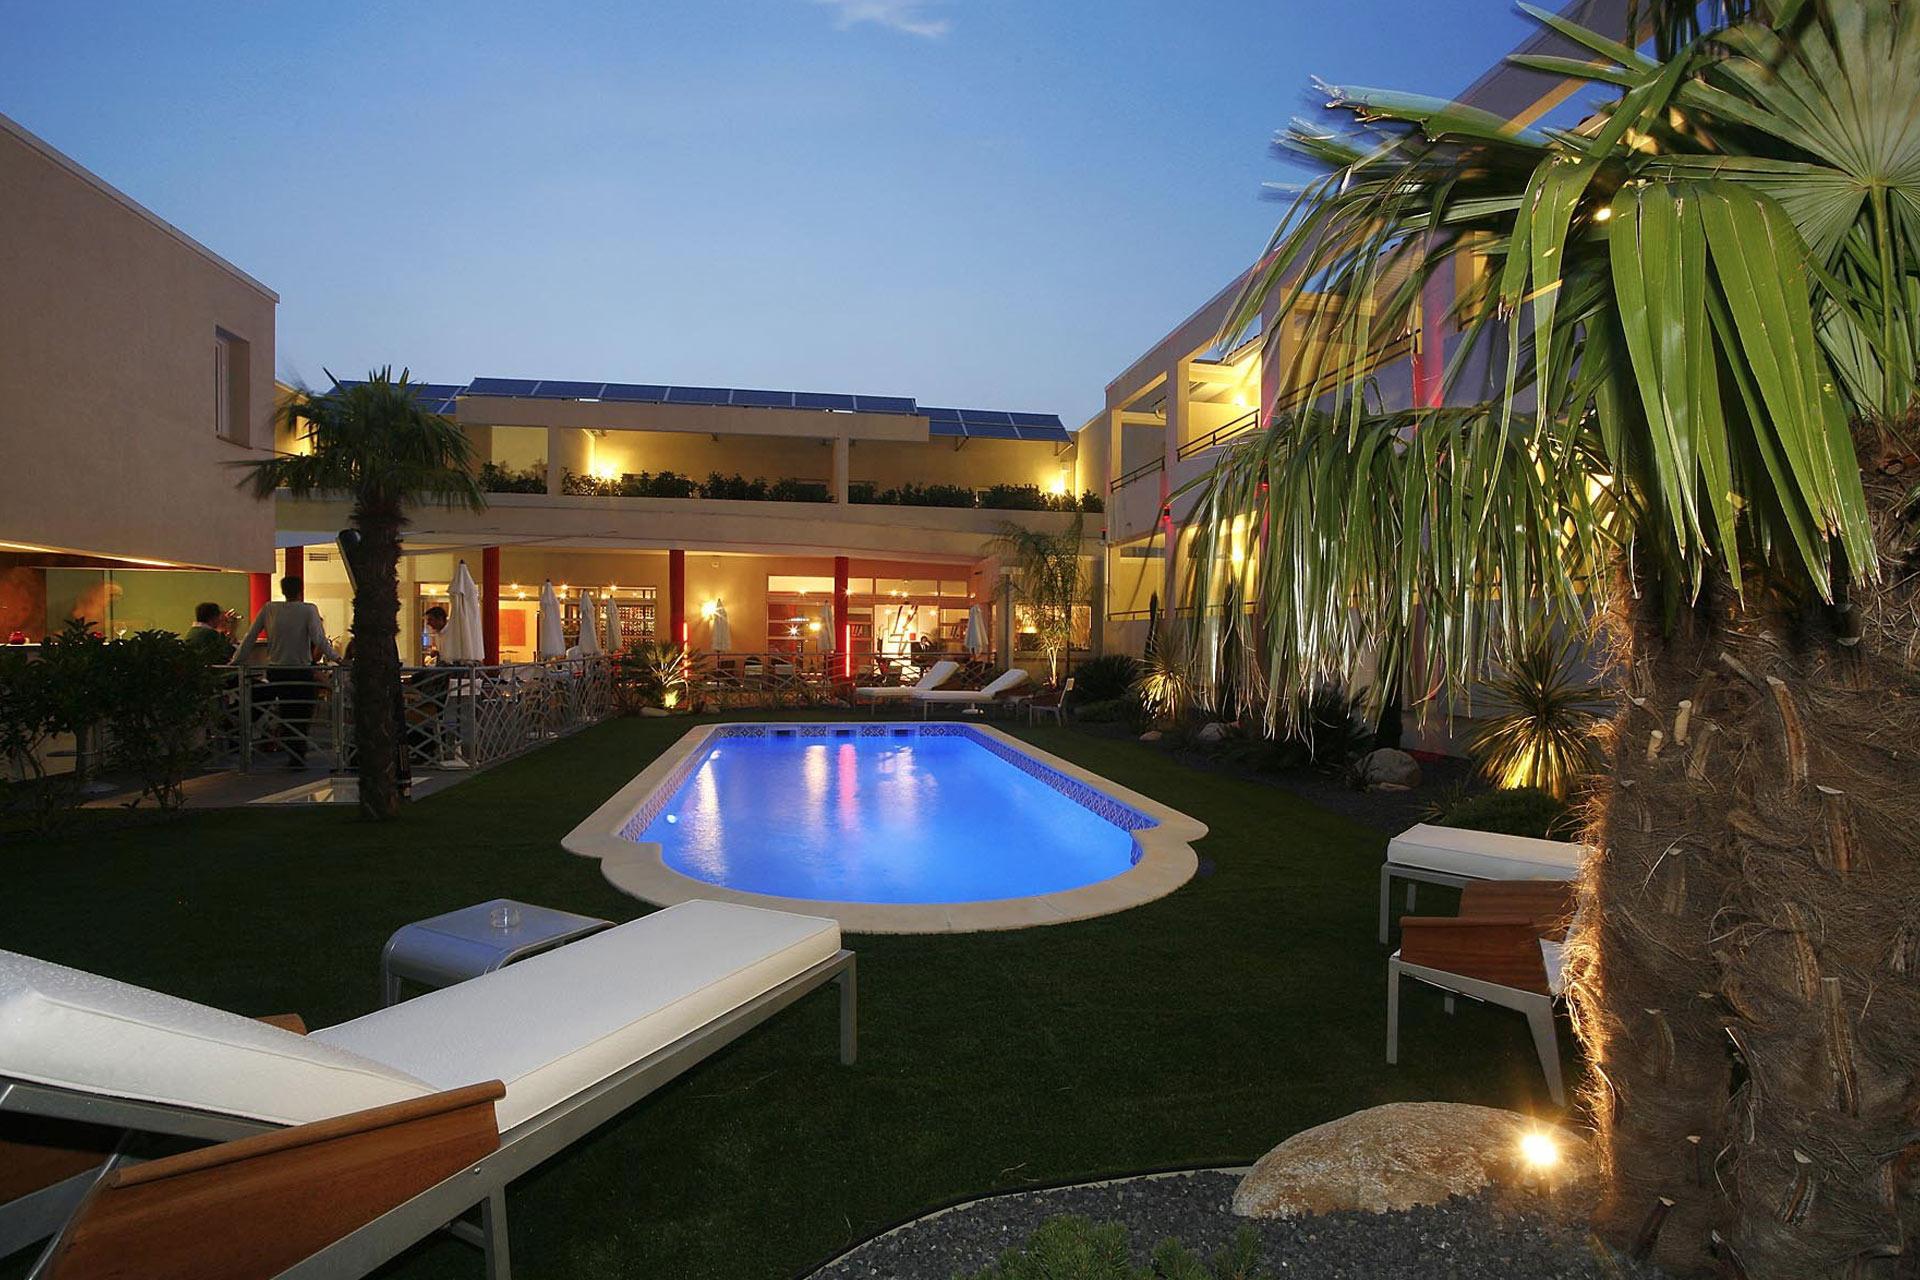 hotel perpignan hotel la fauceille hotels roussillon hotel perpignan. Black Bedroom Furniture Sets. Home Design Ideas